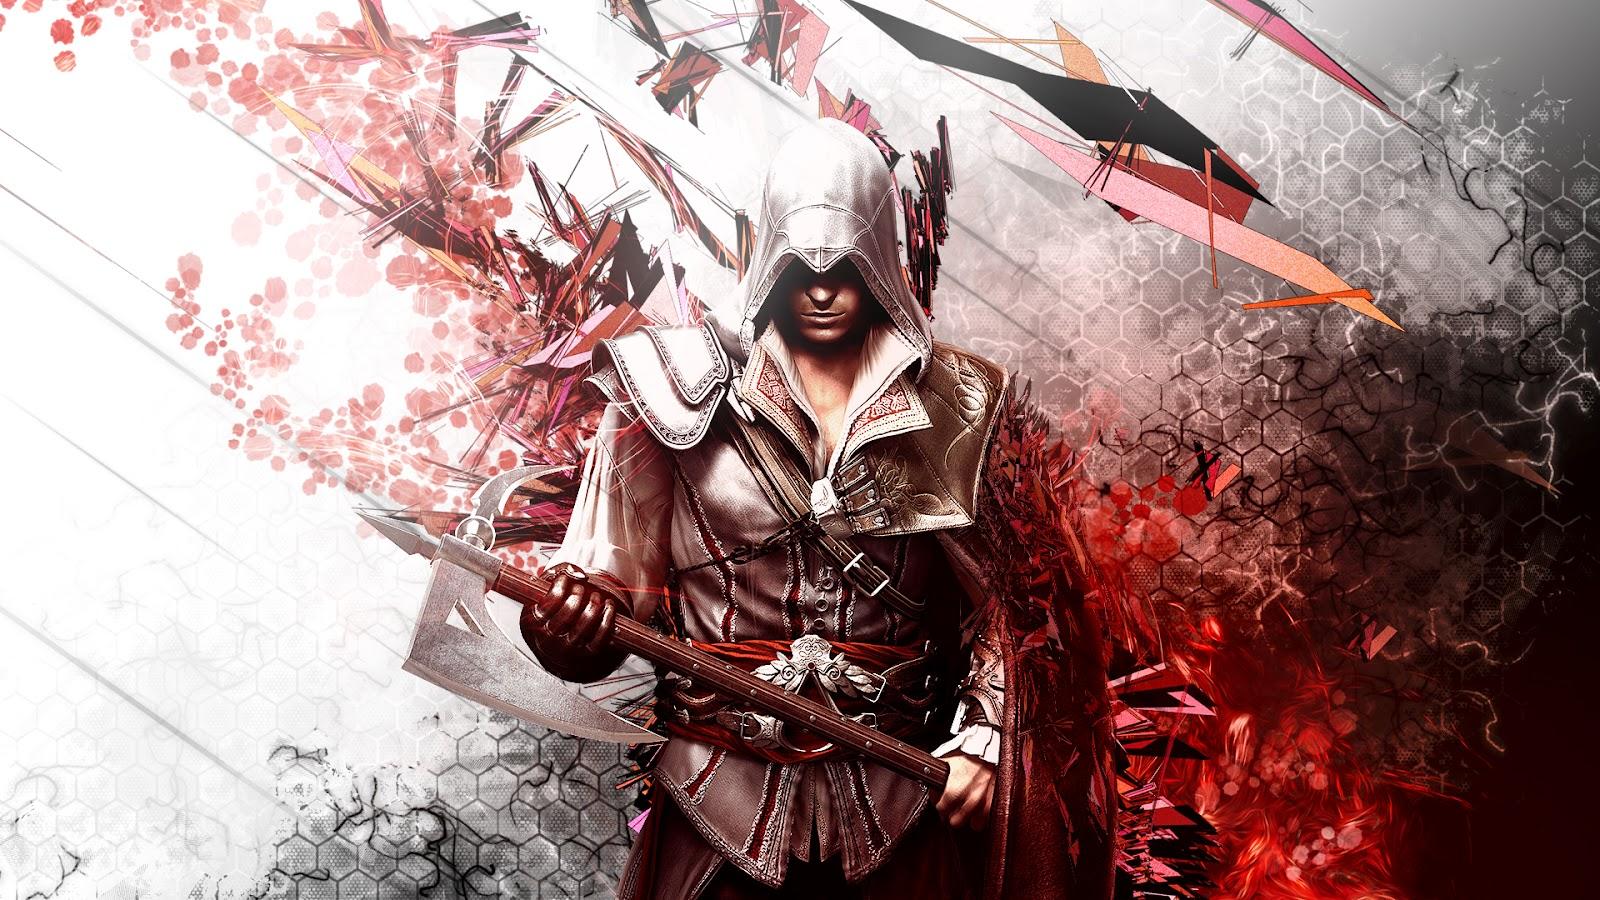 Assassin Creed 2 HD Wallpaper 1080p PiCsHoliC 1600x900